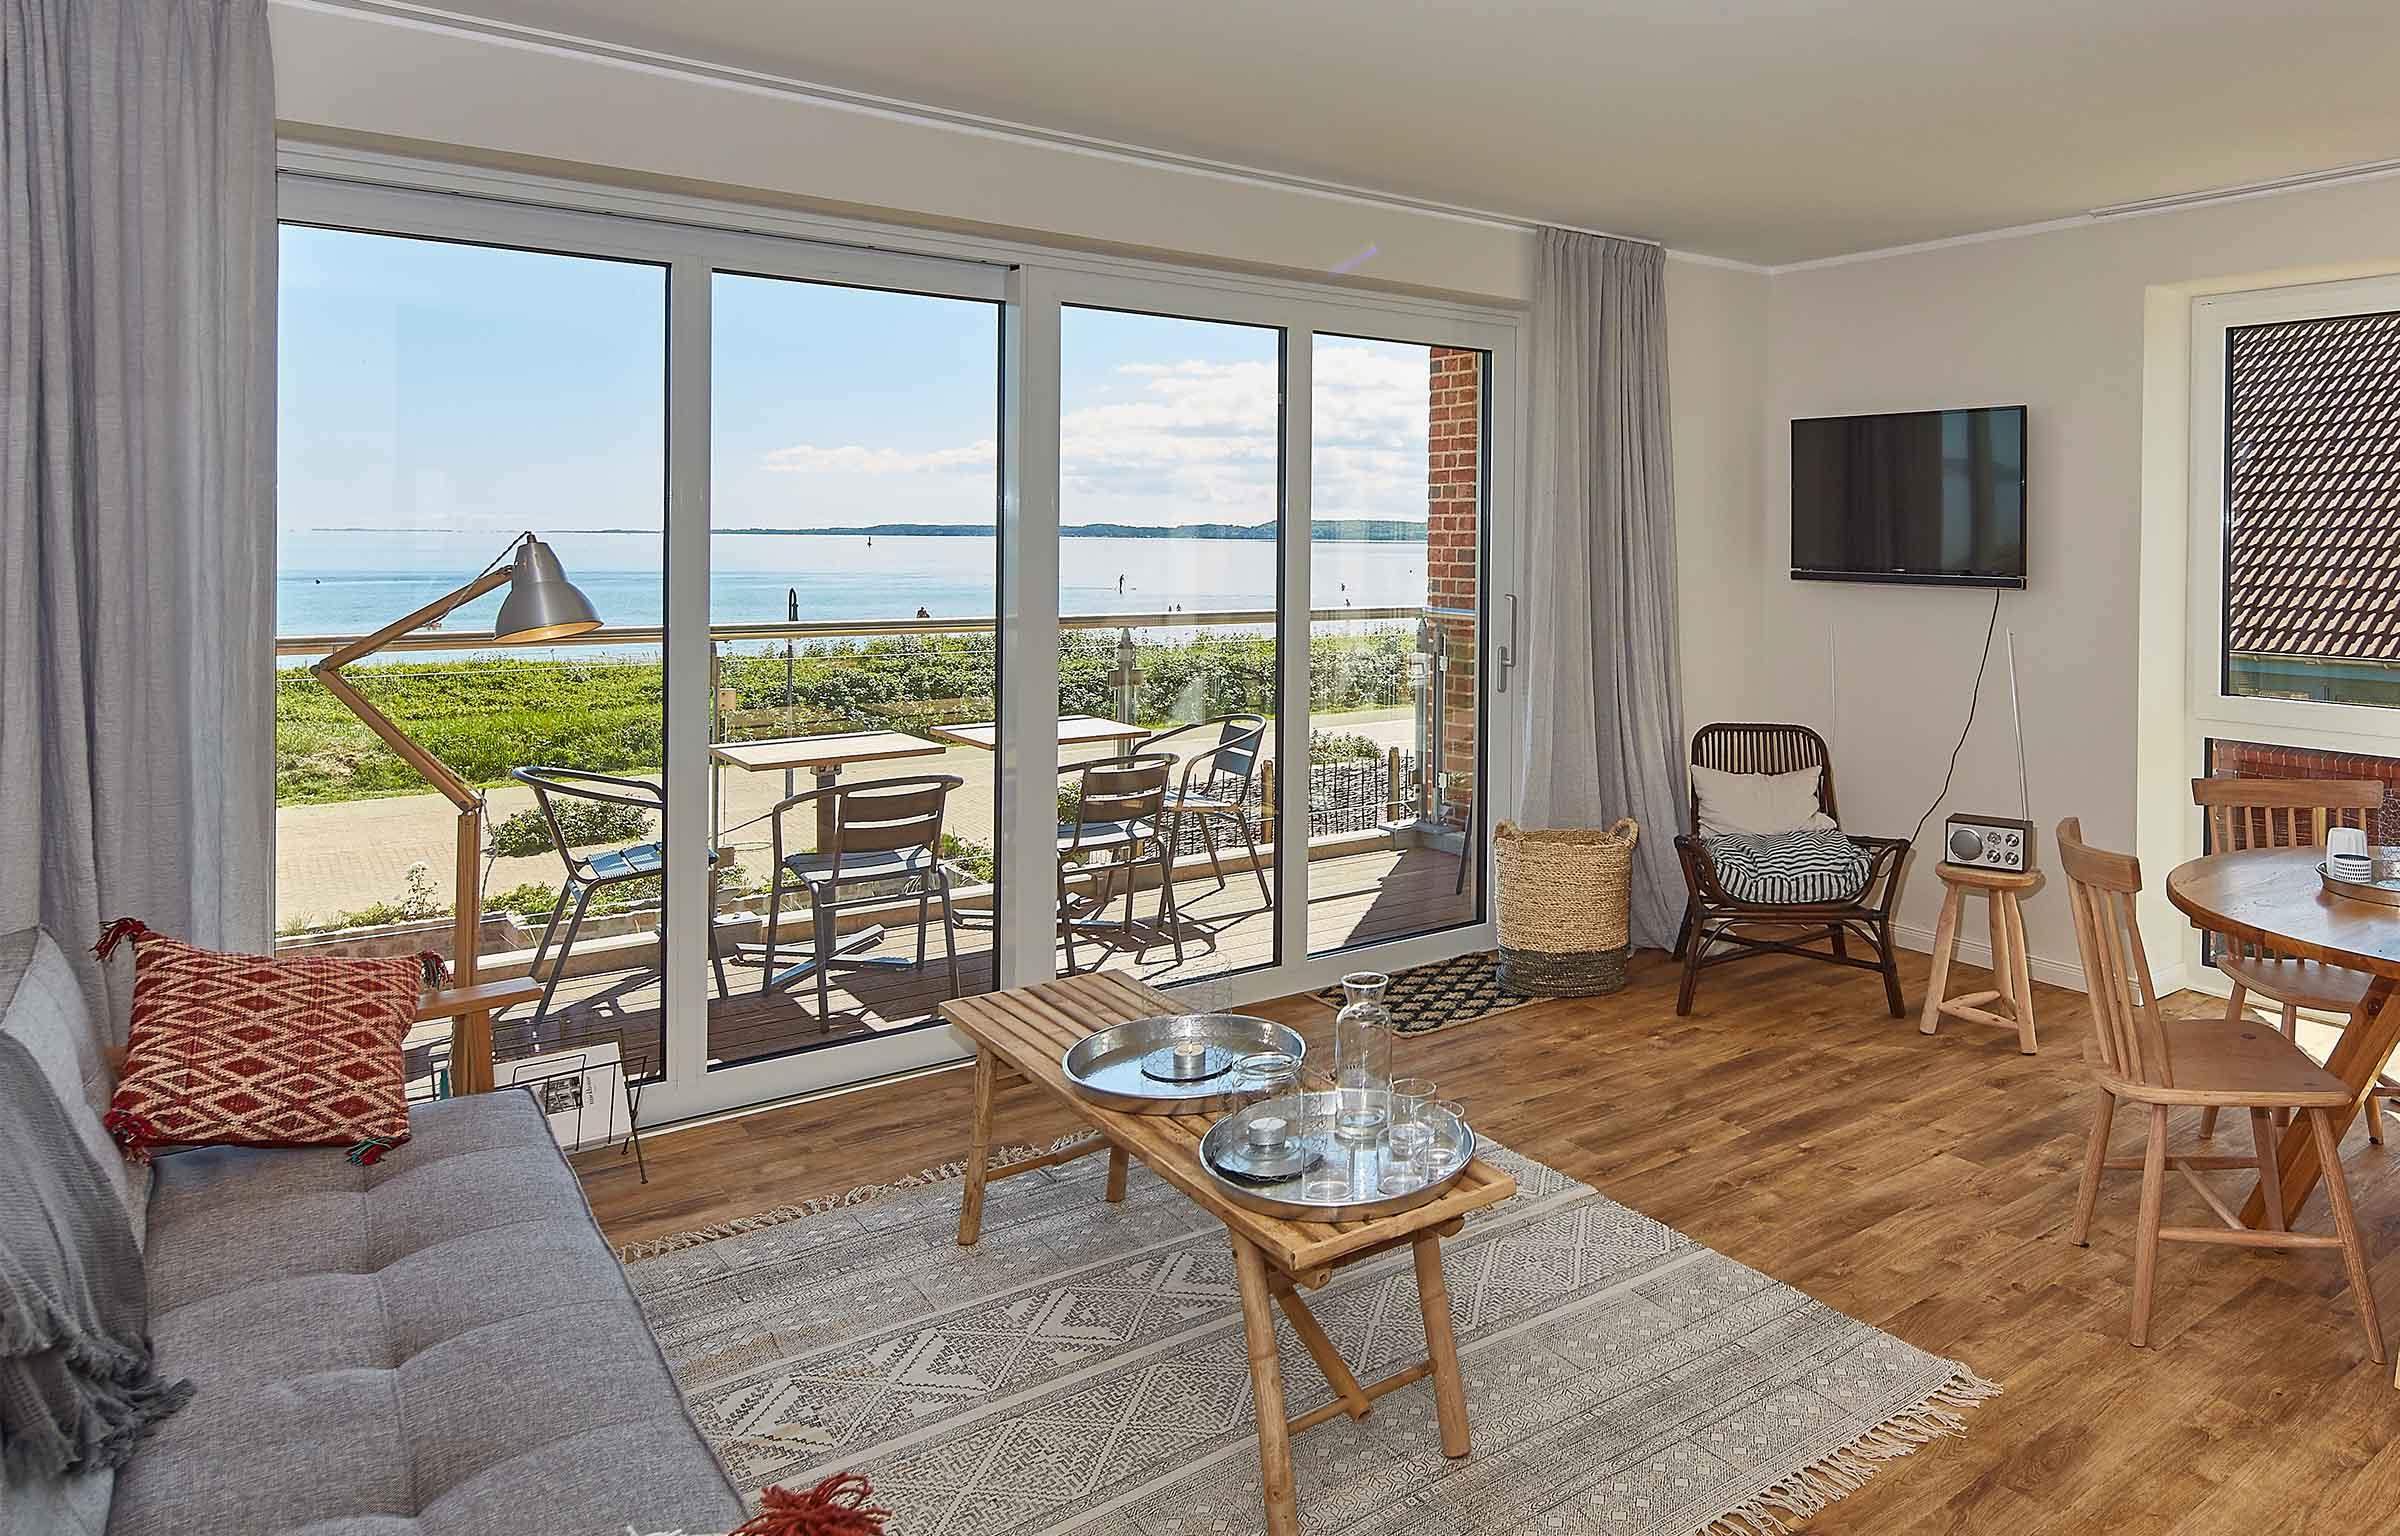 das ostsee strandhaus ostsee strandhaus holnis. Black Bedroom Furniture Sets. Home Design Ideas